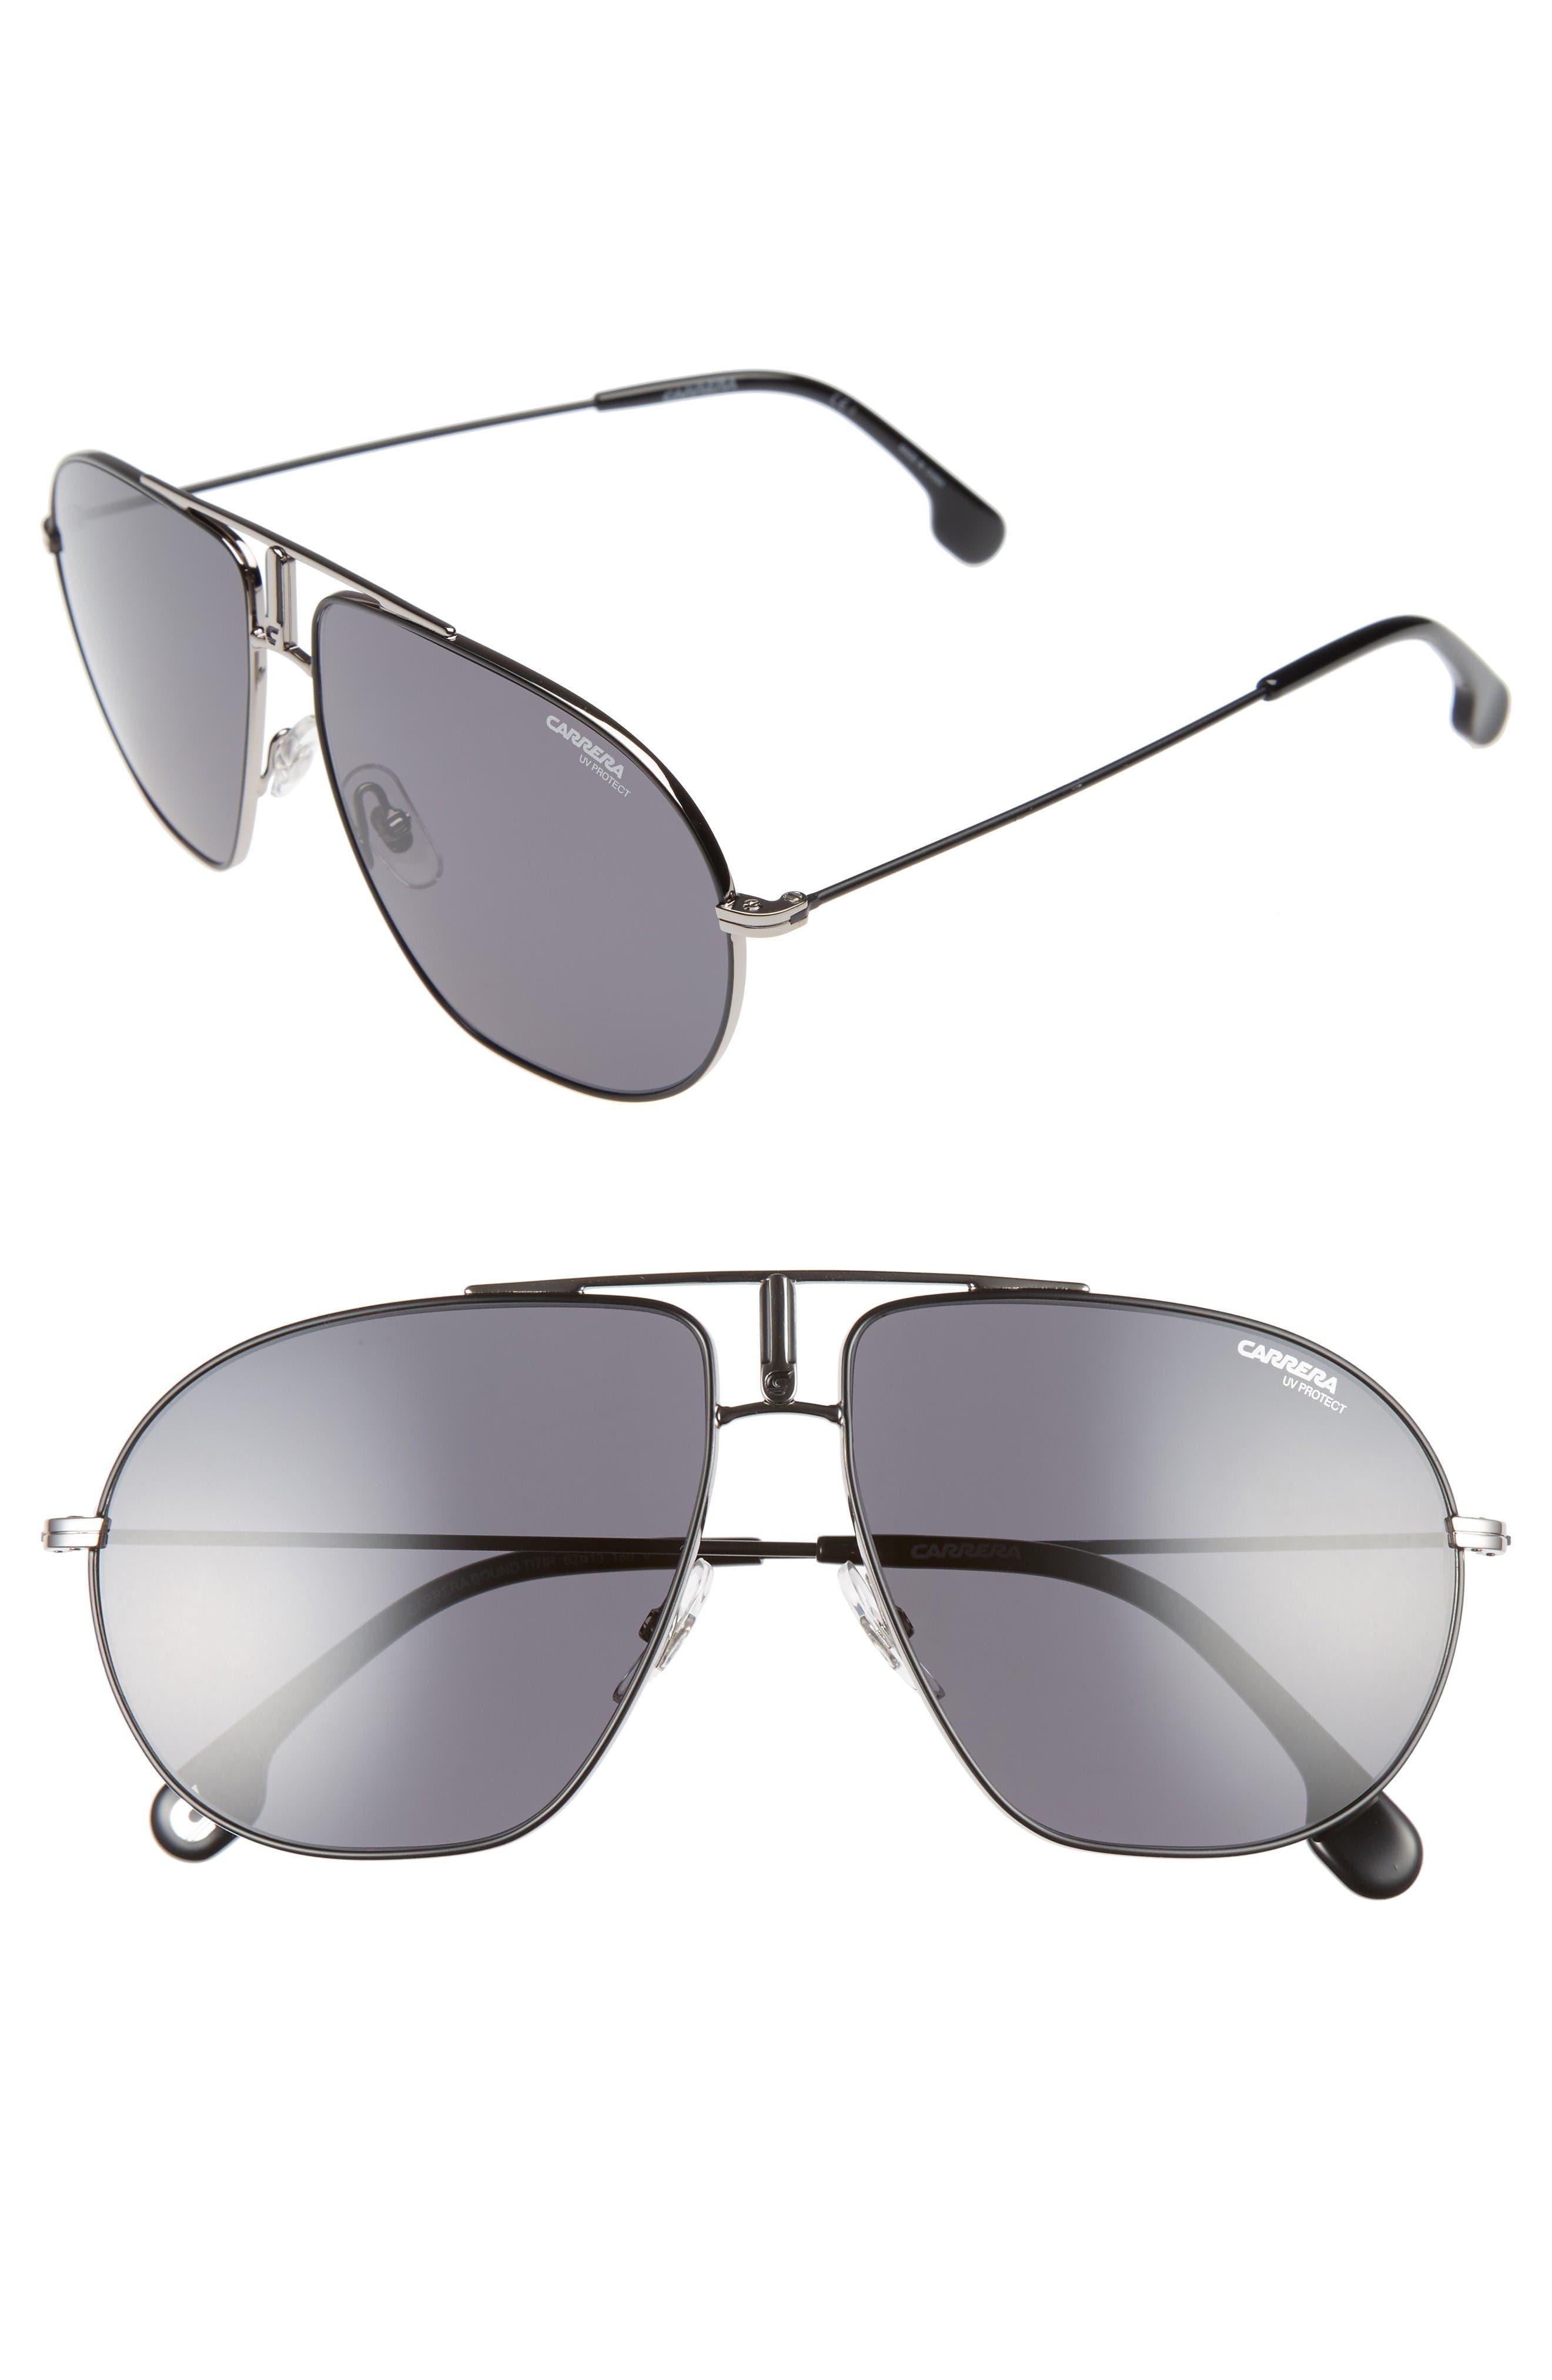 Alternate Image 1 Selected - Carrera Eyewear Bounds 62mm Gradient Aviator Sunglasses